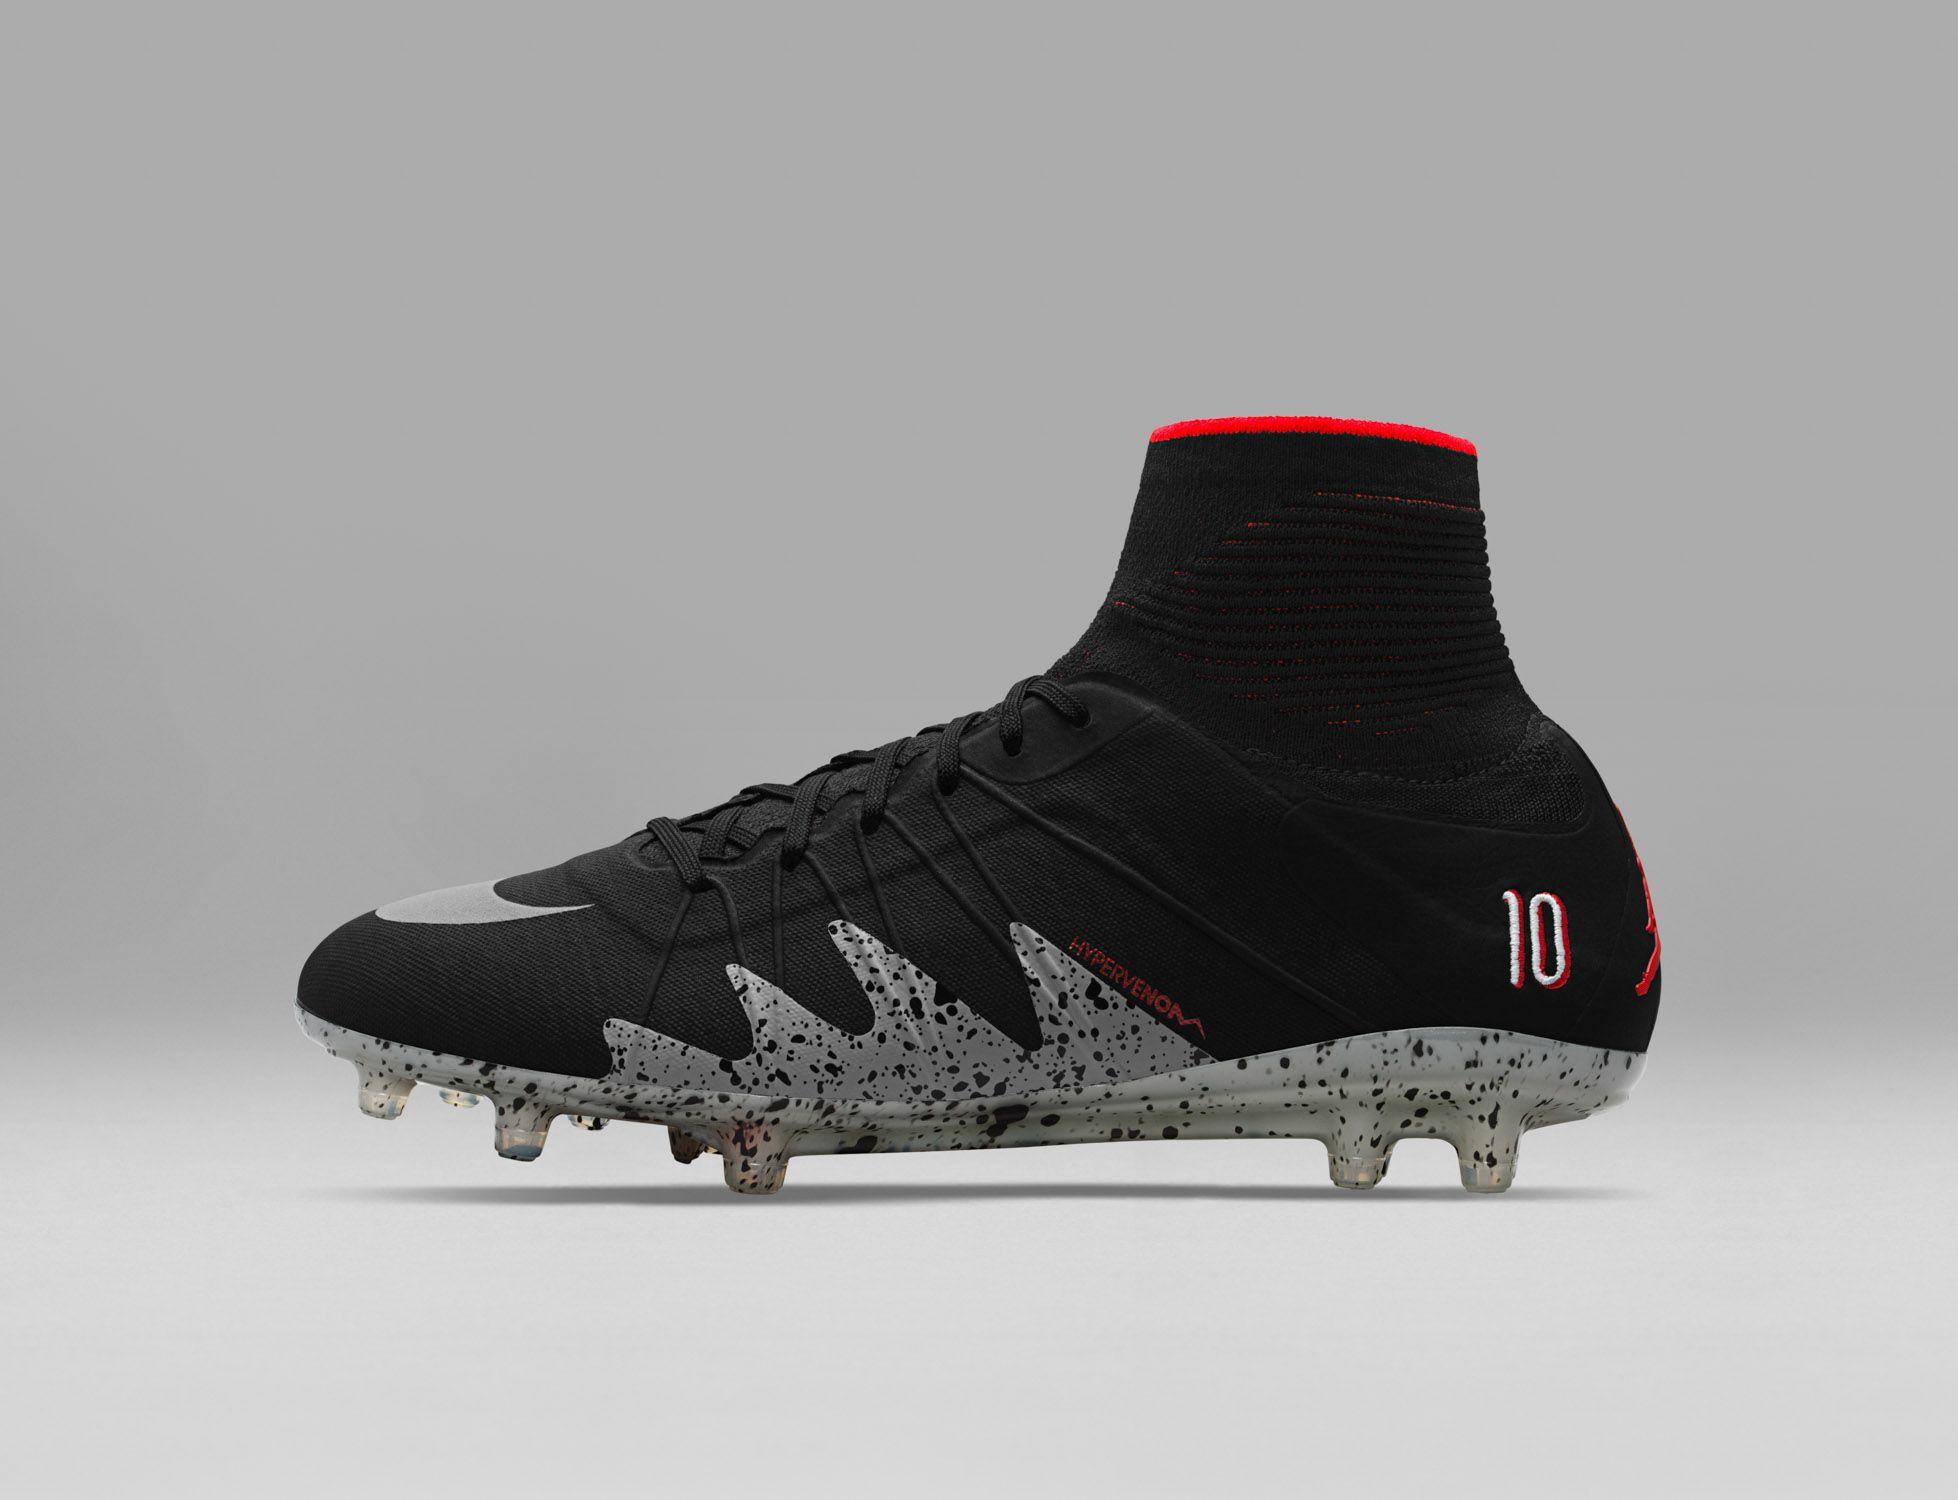 nike football schuhe nike and jordan shoes